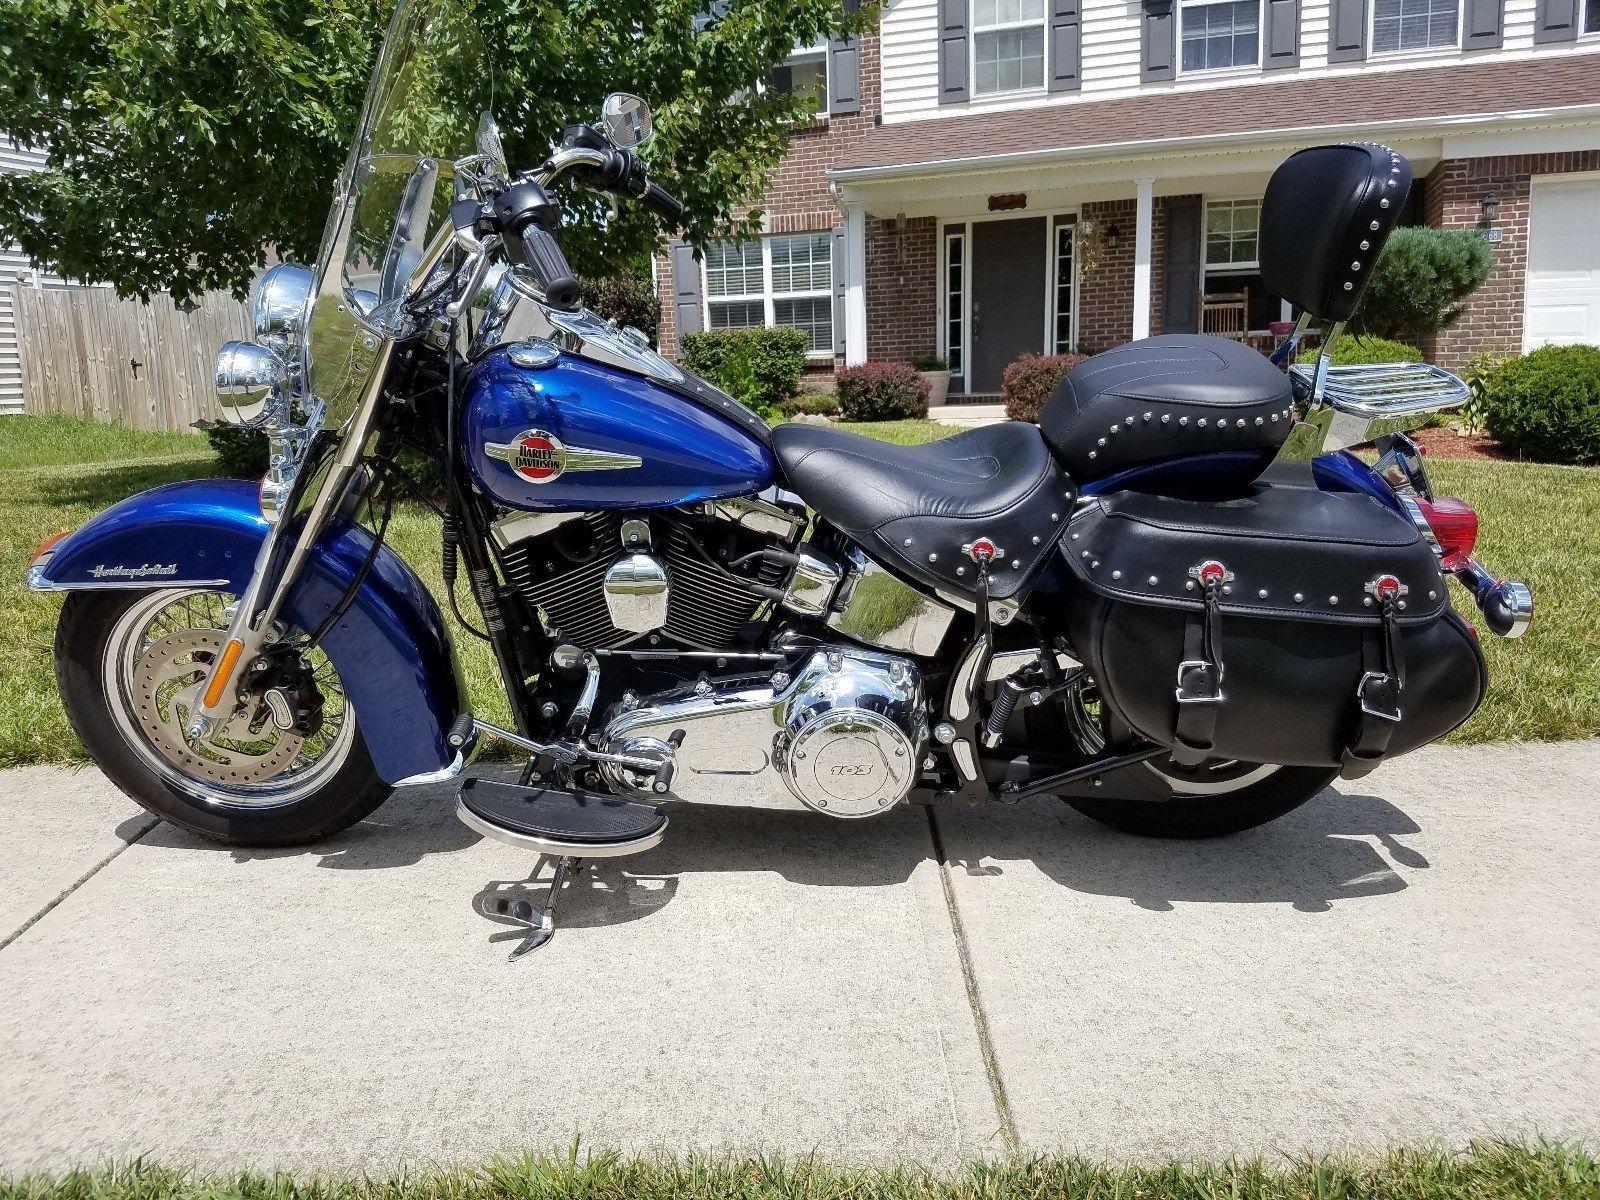 2016 Harley-Davidson Softail   Harley davidson and Clic bikes